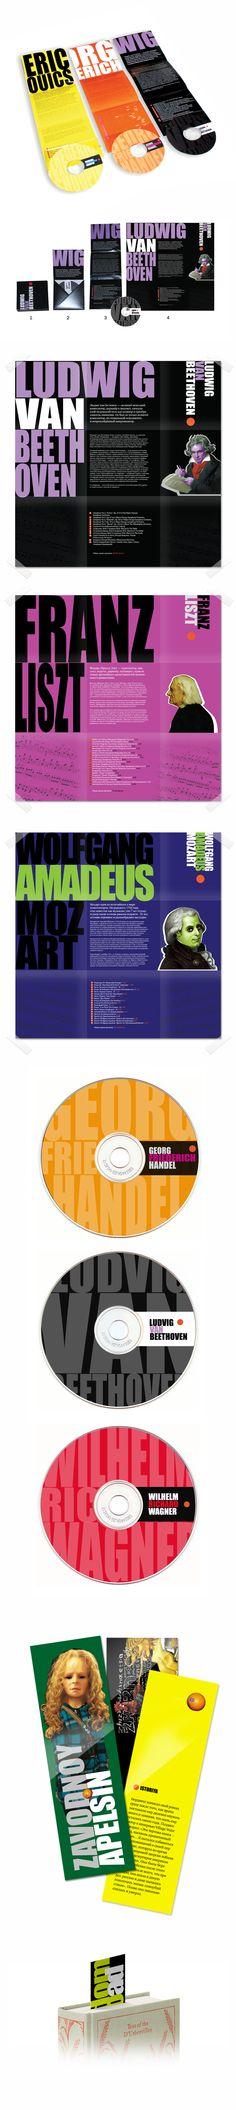 """A Clockwork Orage"" by Anthony Burgess – CD and bookmark design  2008  maximdesigner.com"